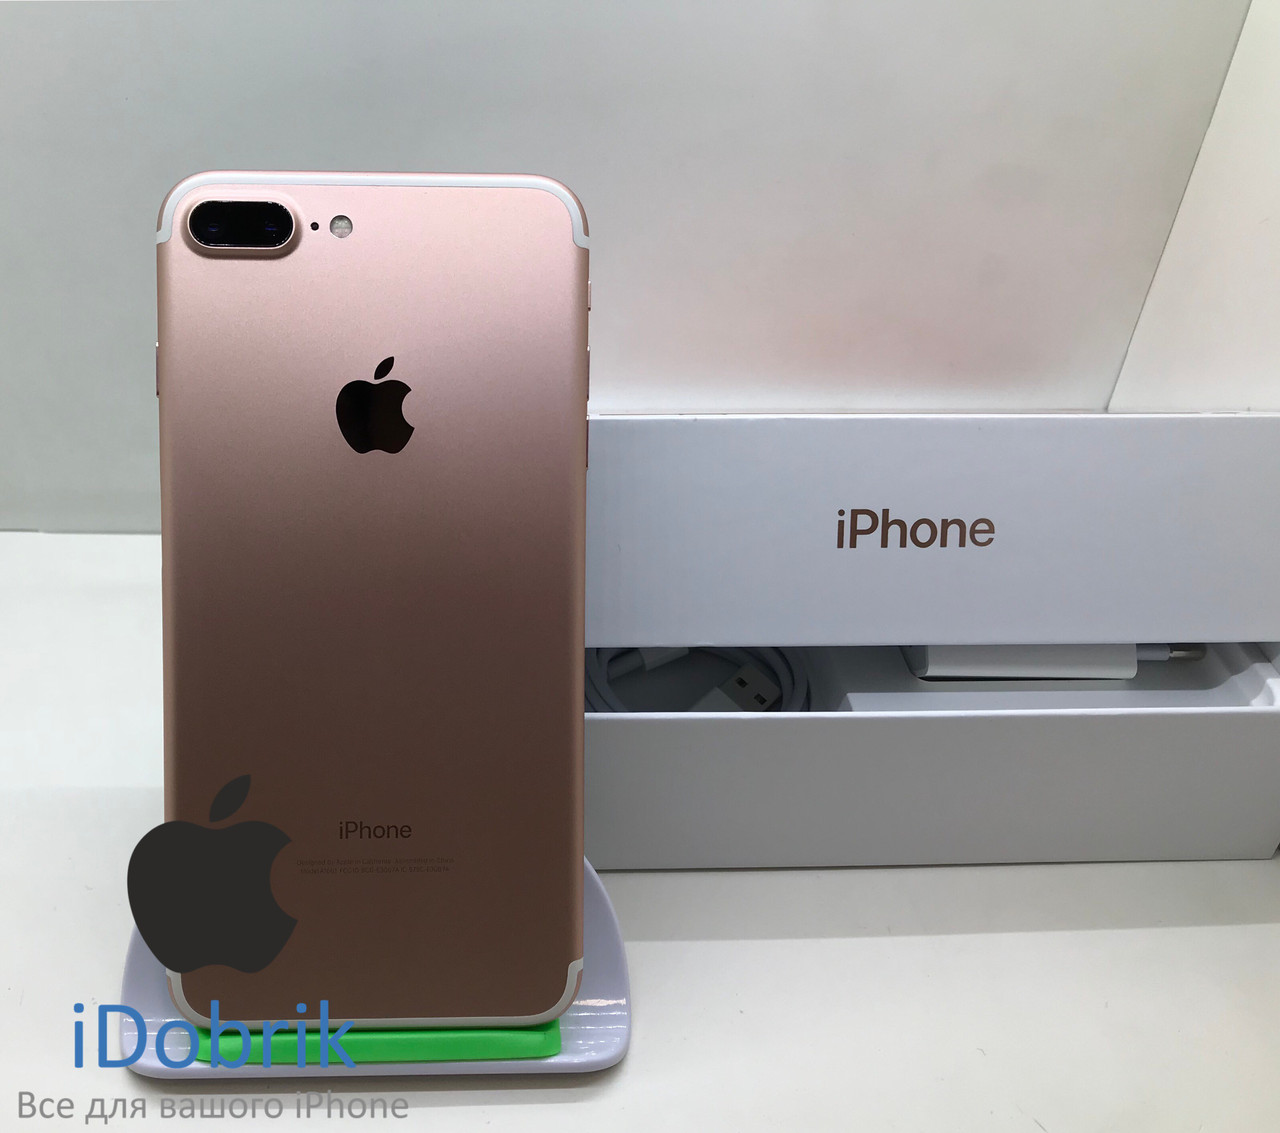 Б/У iPhone 7 Plus 256gb Rose Gold Neverlock 9/10